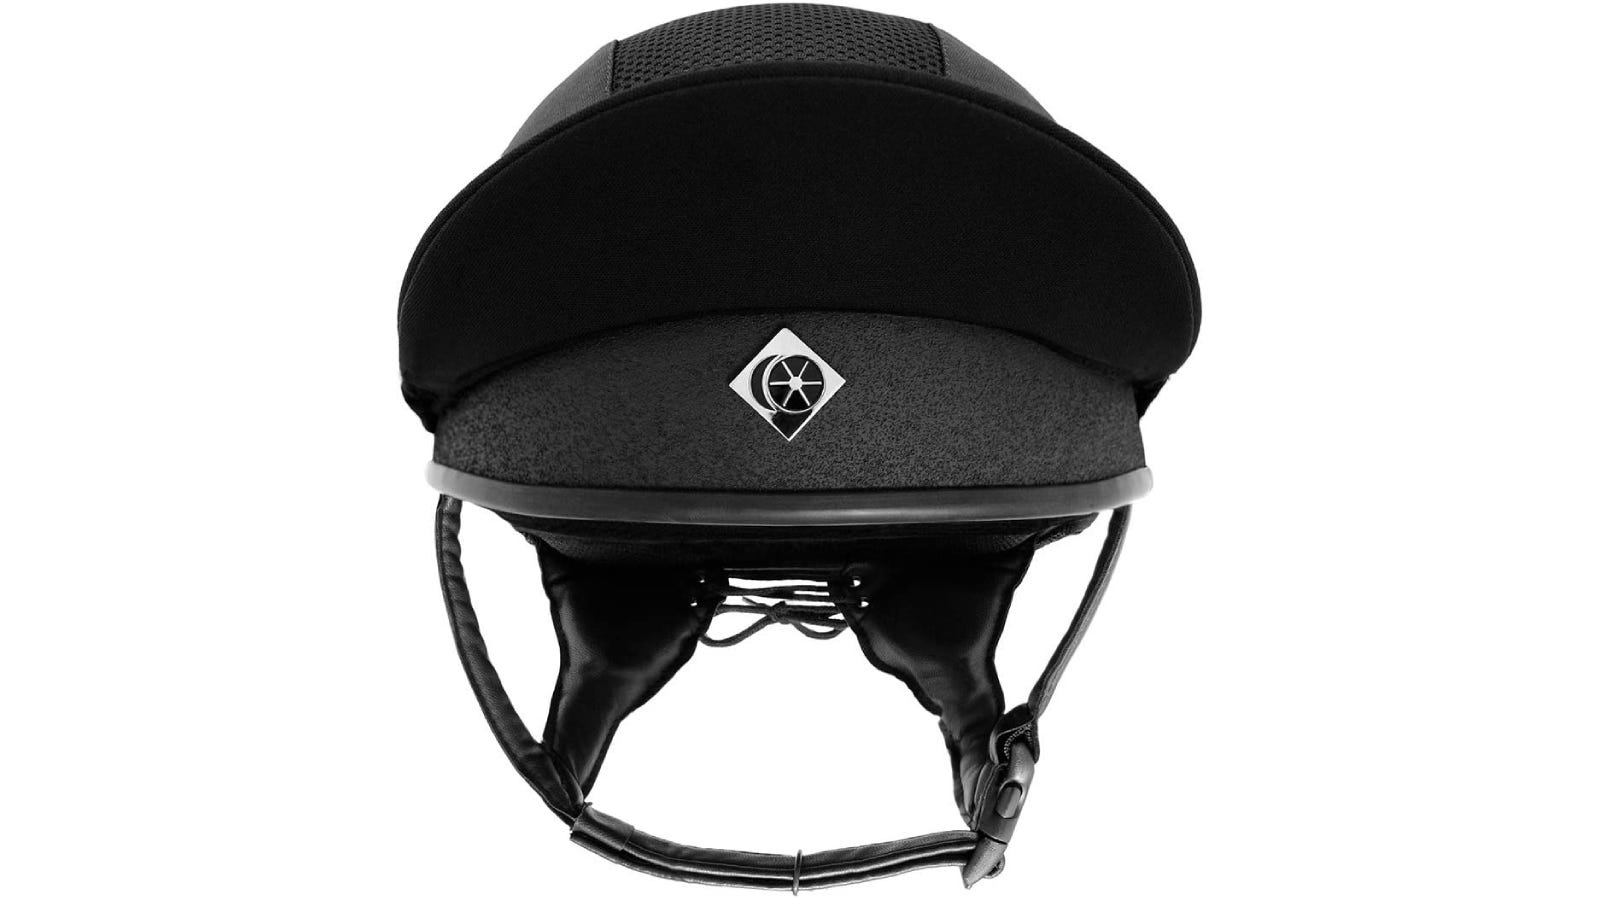 A horse riding helmet with a high visor.